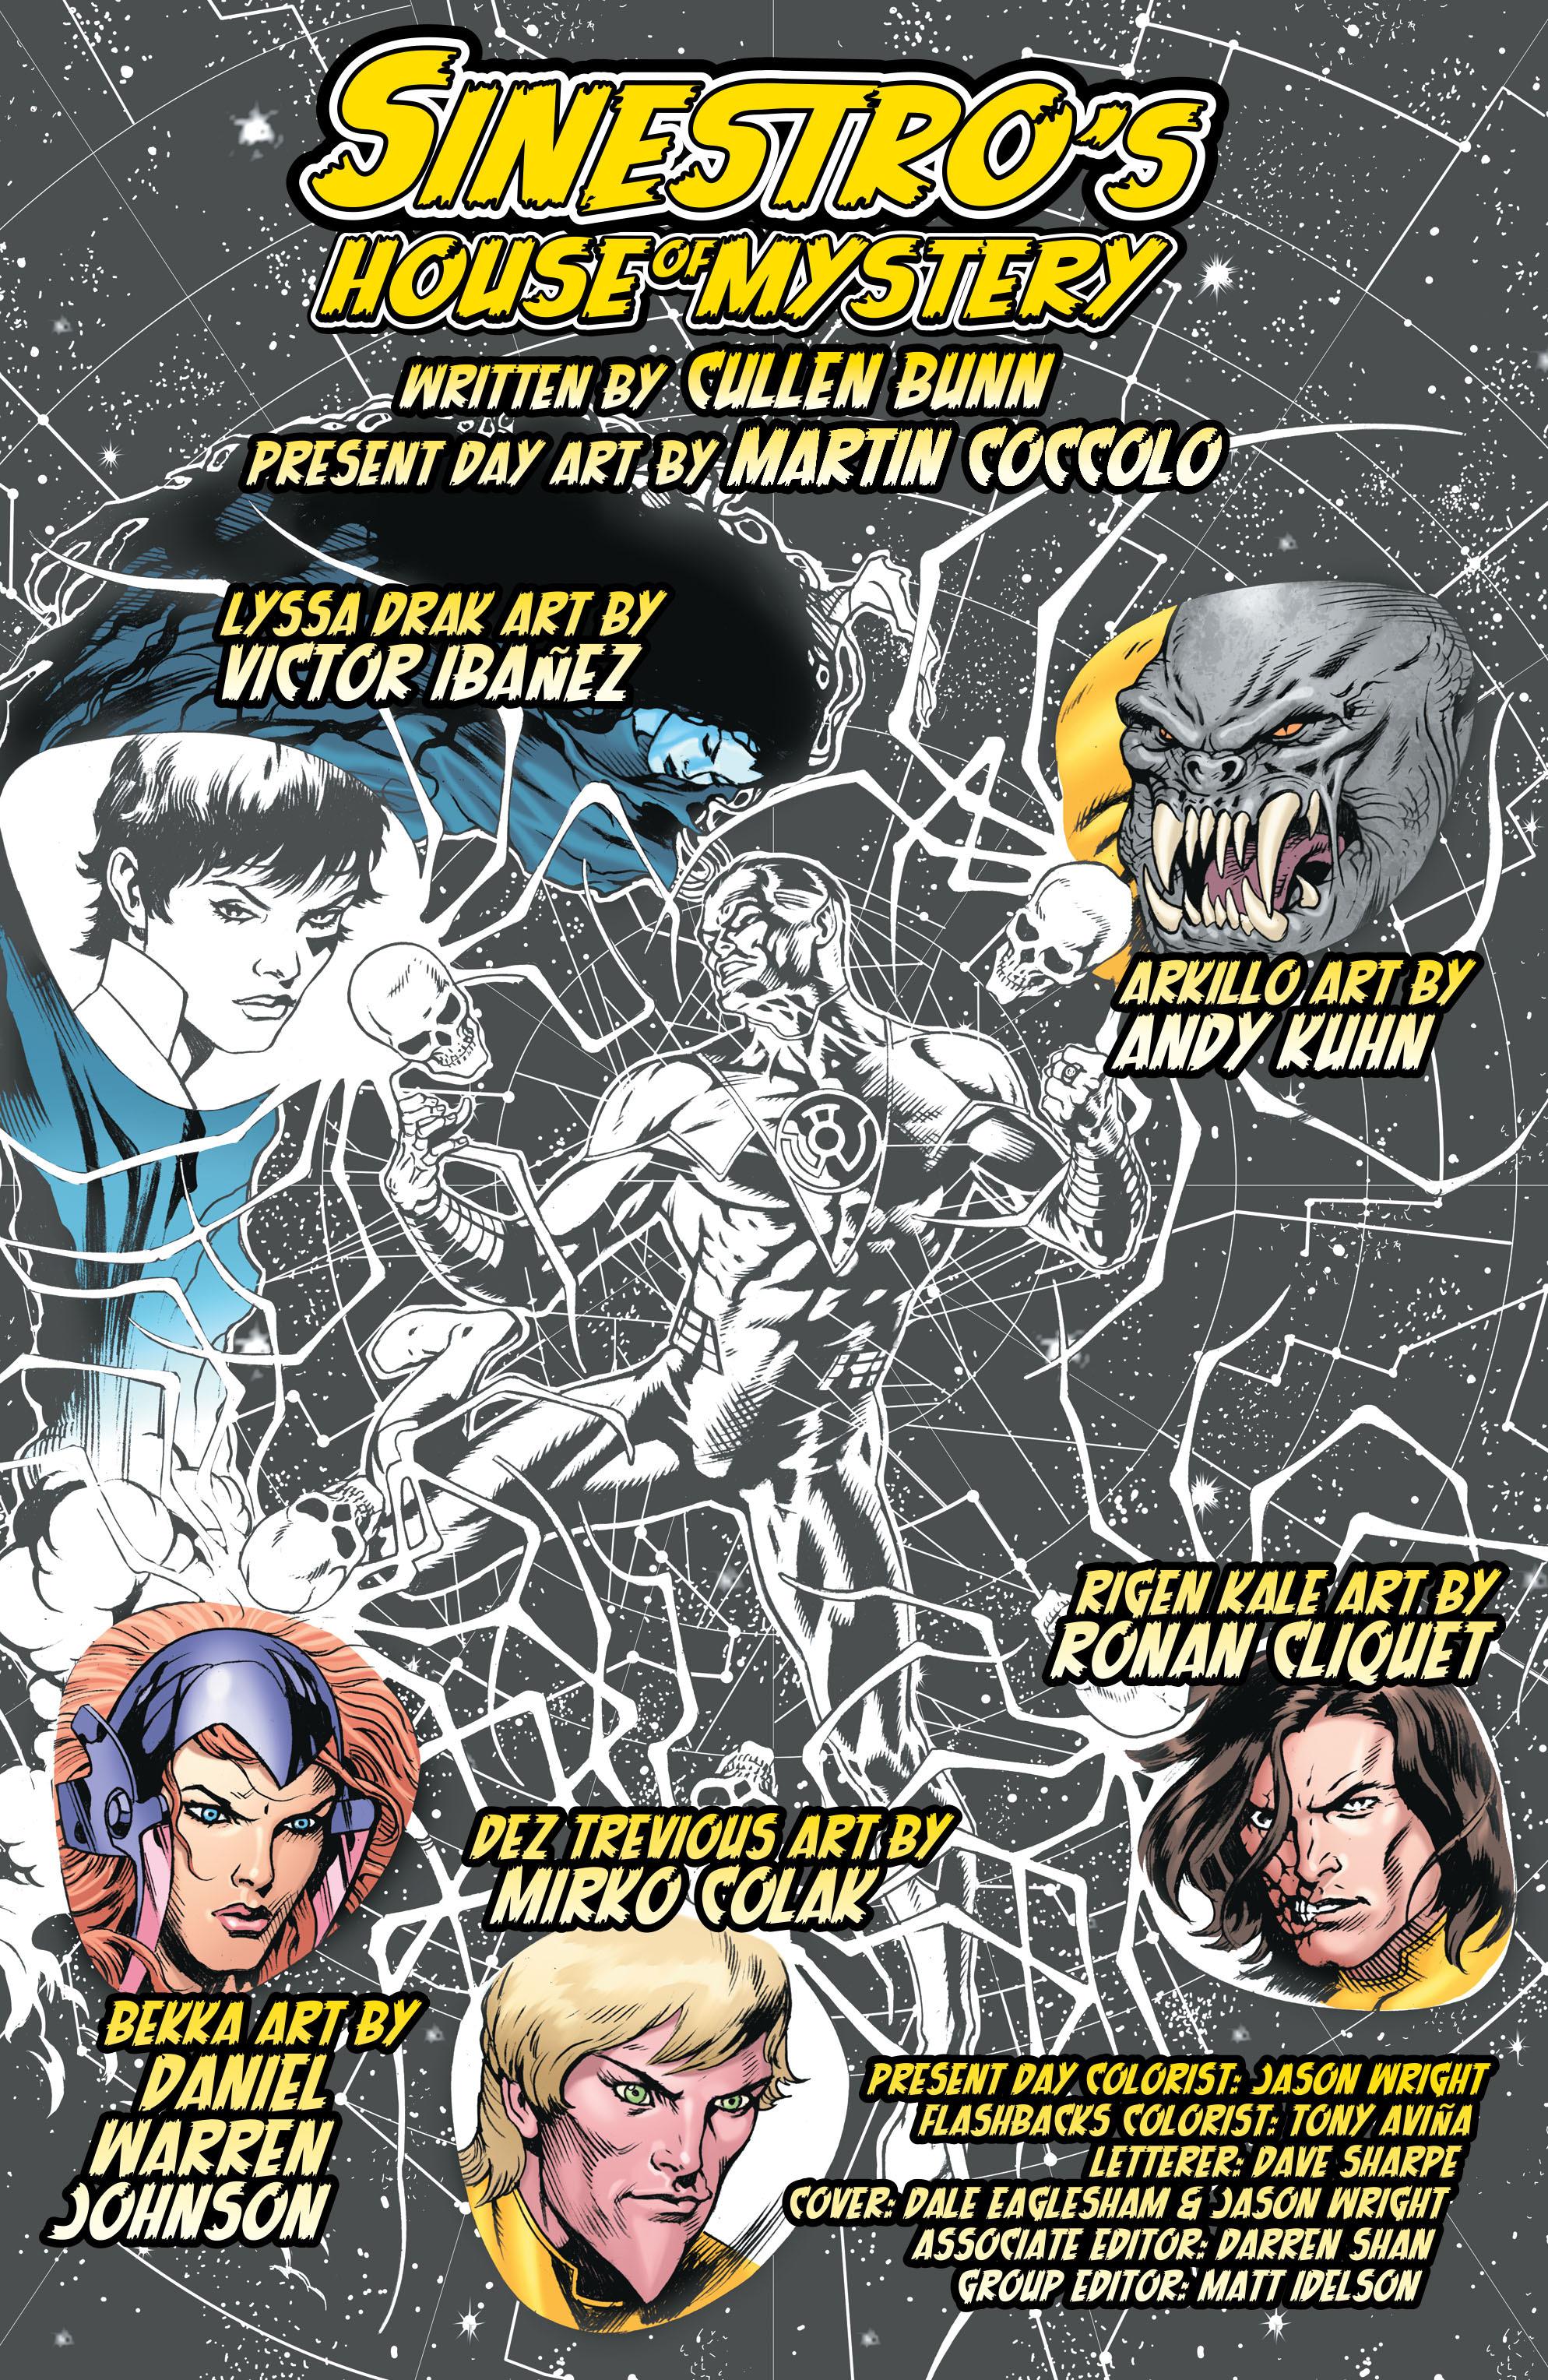 Read online Sinestro comic -  Issue # Annual 1 - 2